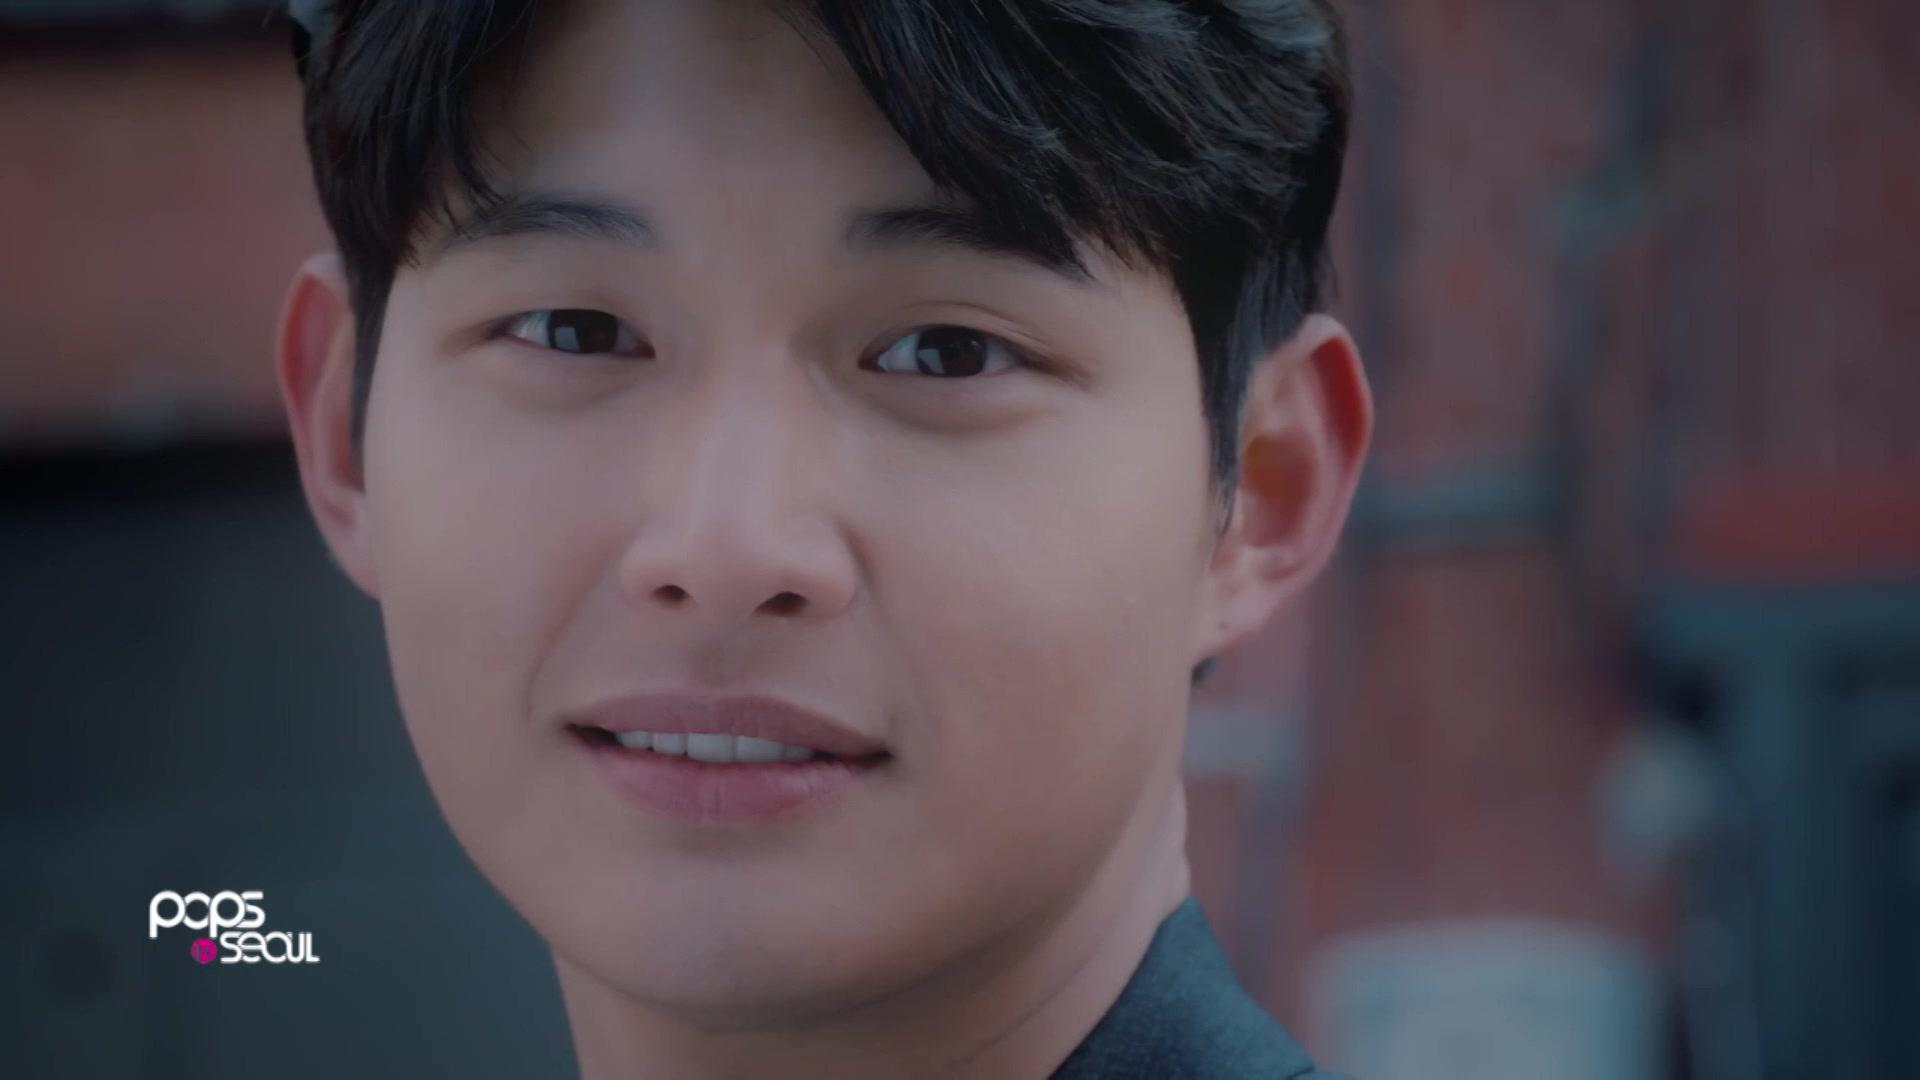 Pops in Seoul Episode 3573